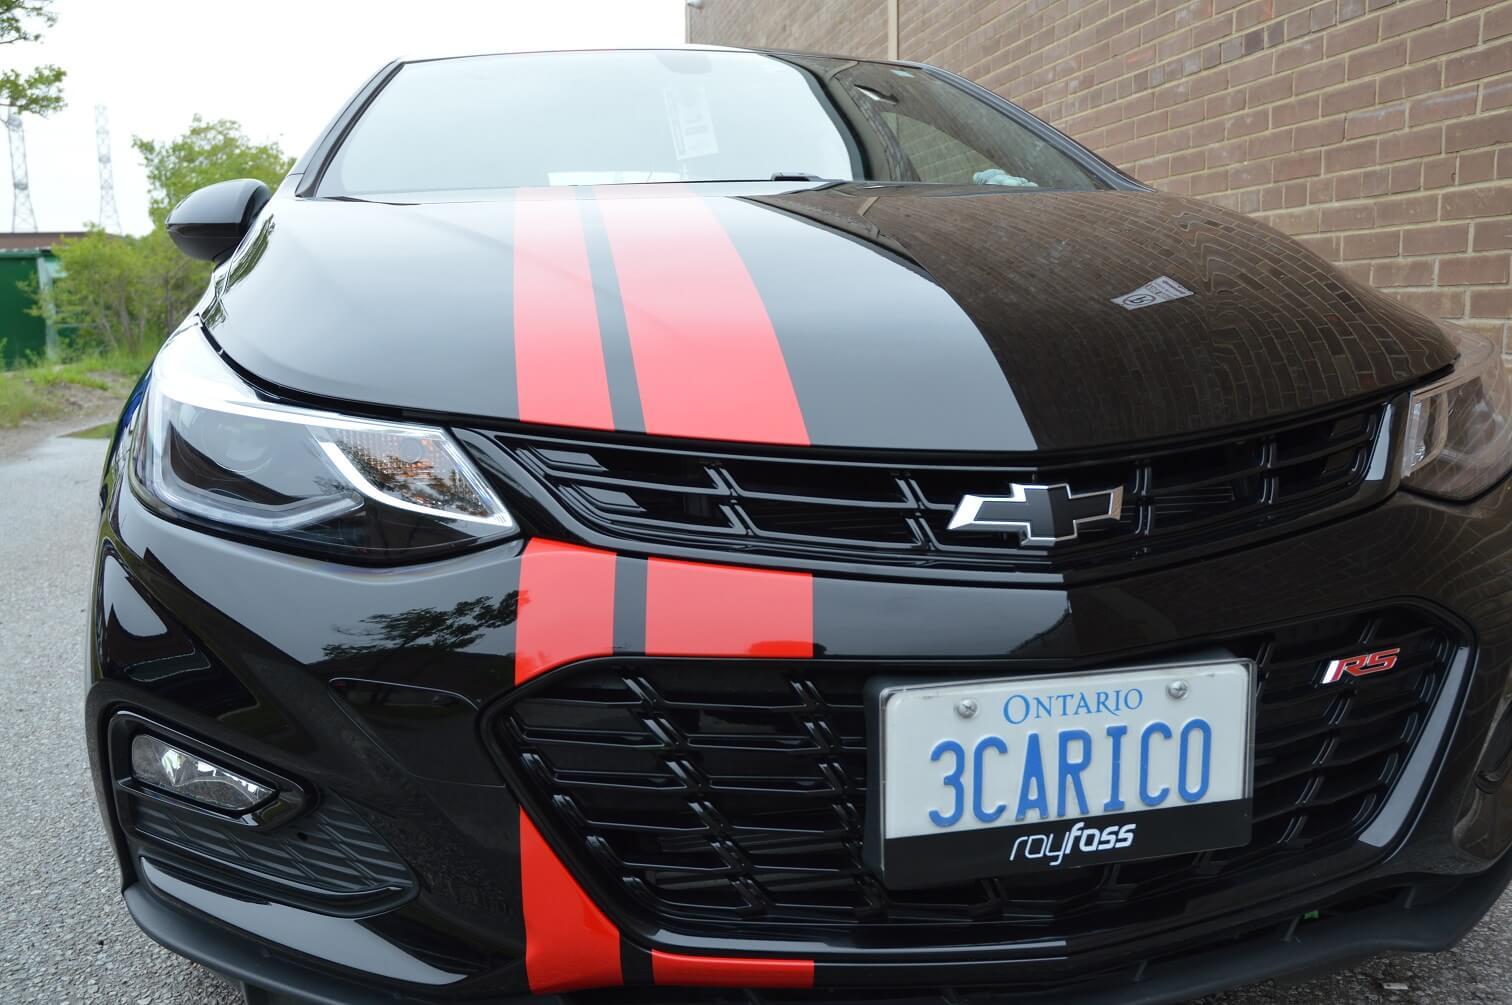 Red racing stripes | Car Wrap Toronto, Front View - Vinyl Wrap Toronto